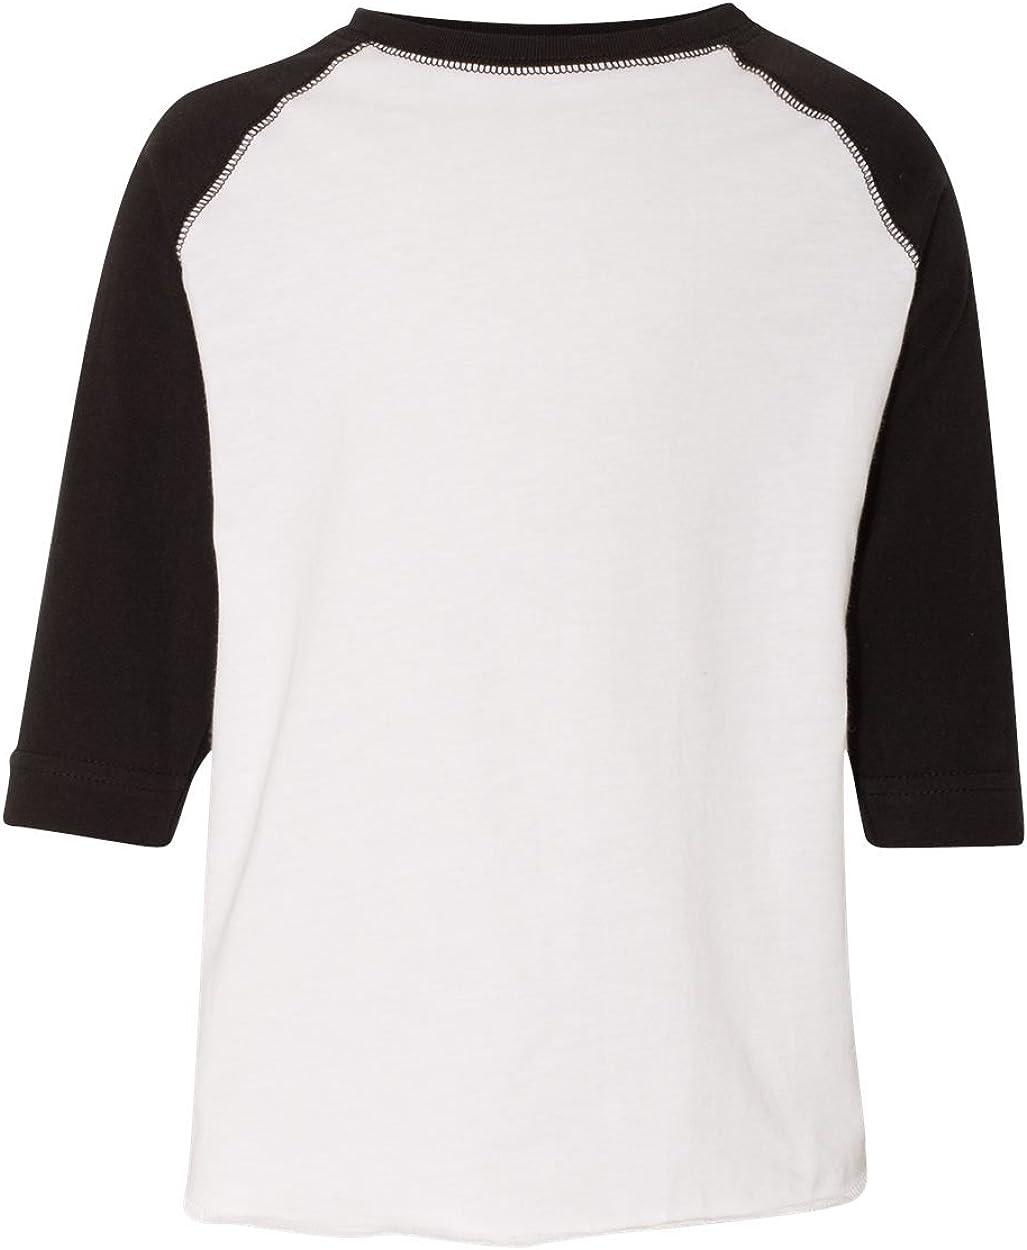 High material Clementine Kids' Toddler Baseball Fine Softline Jersey Surprise price T-Shirt